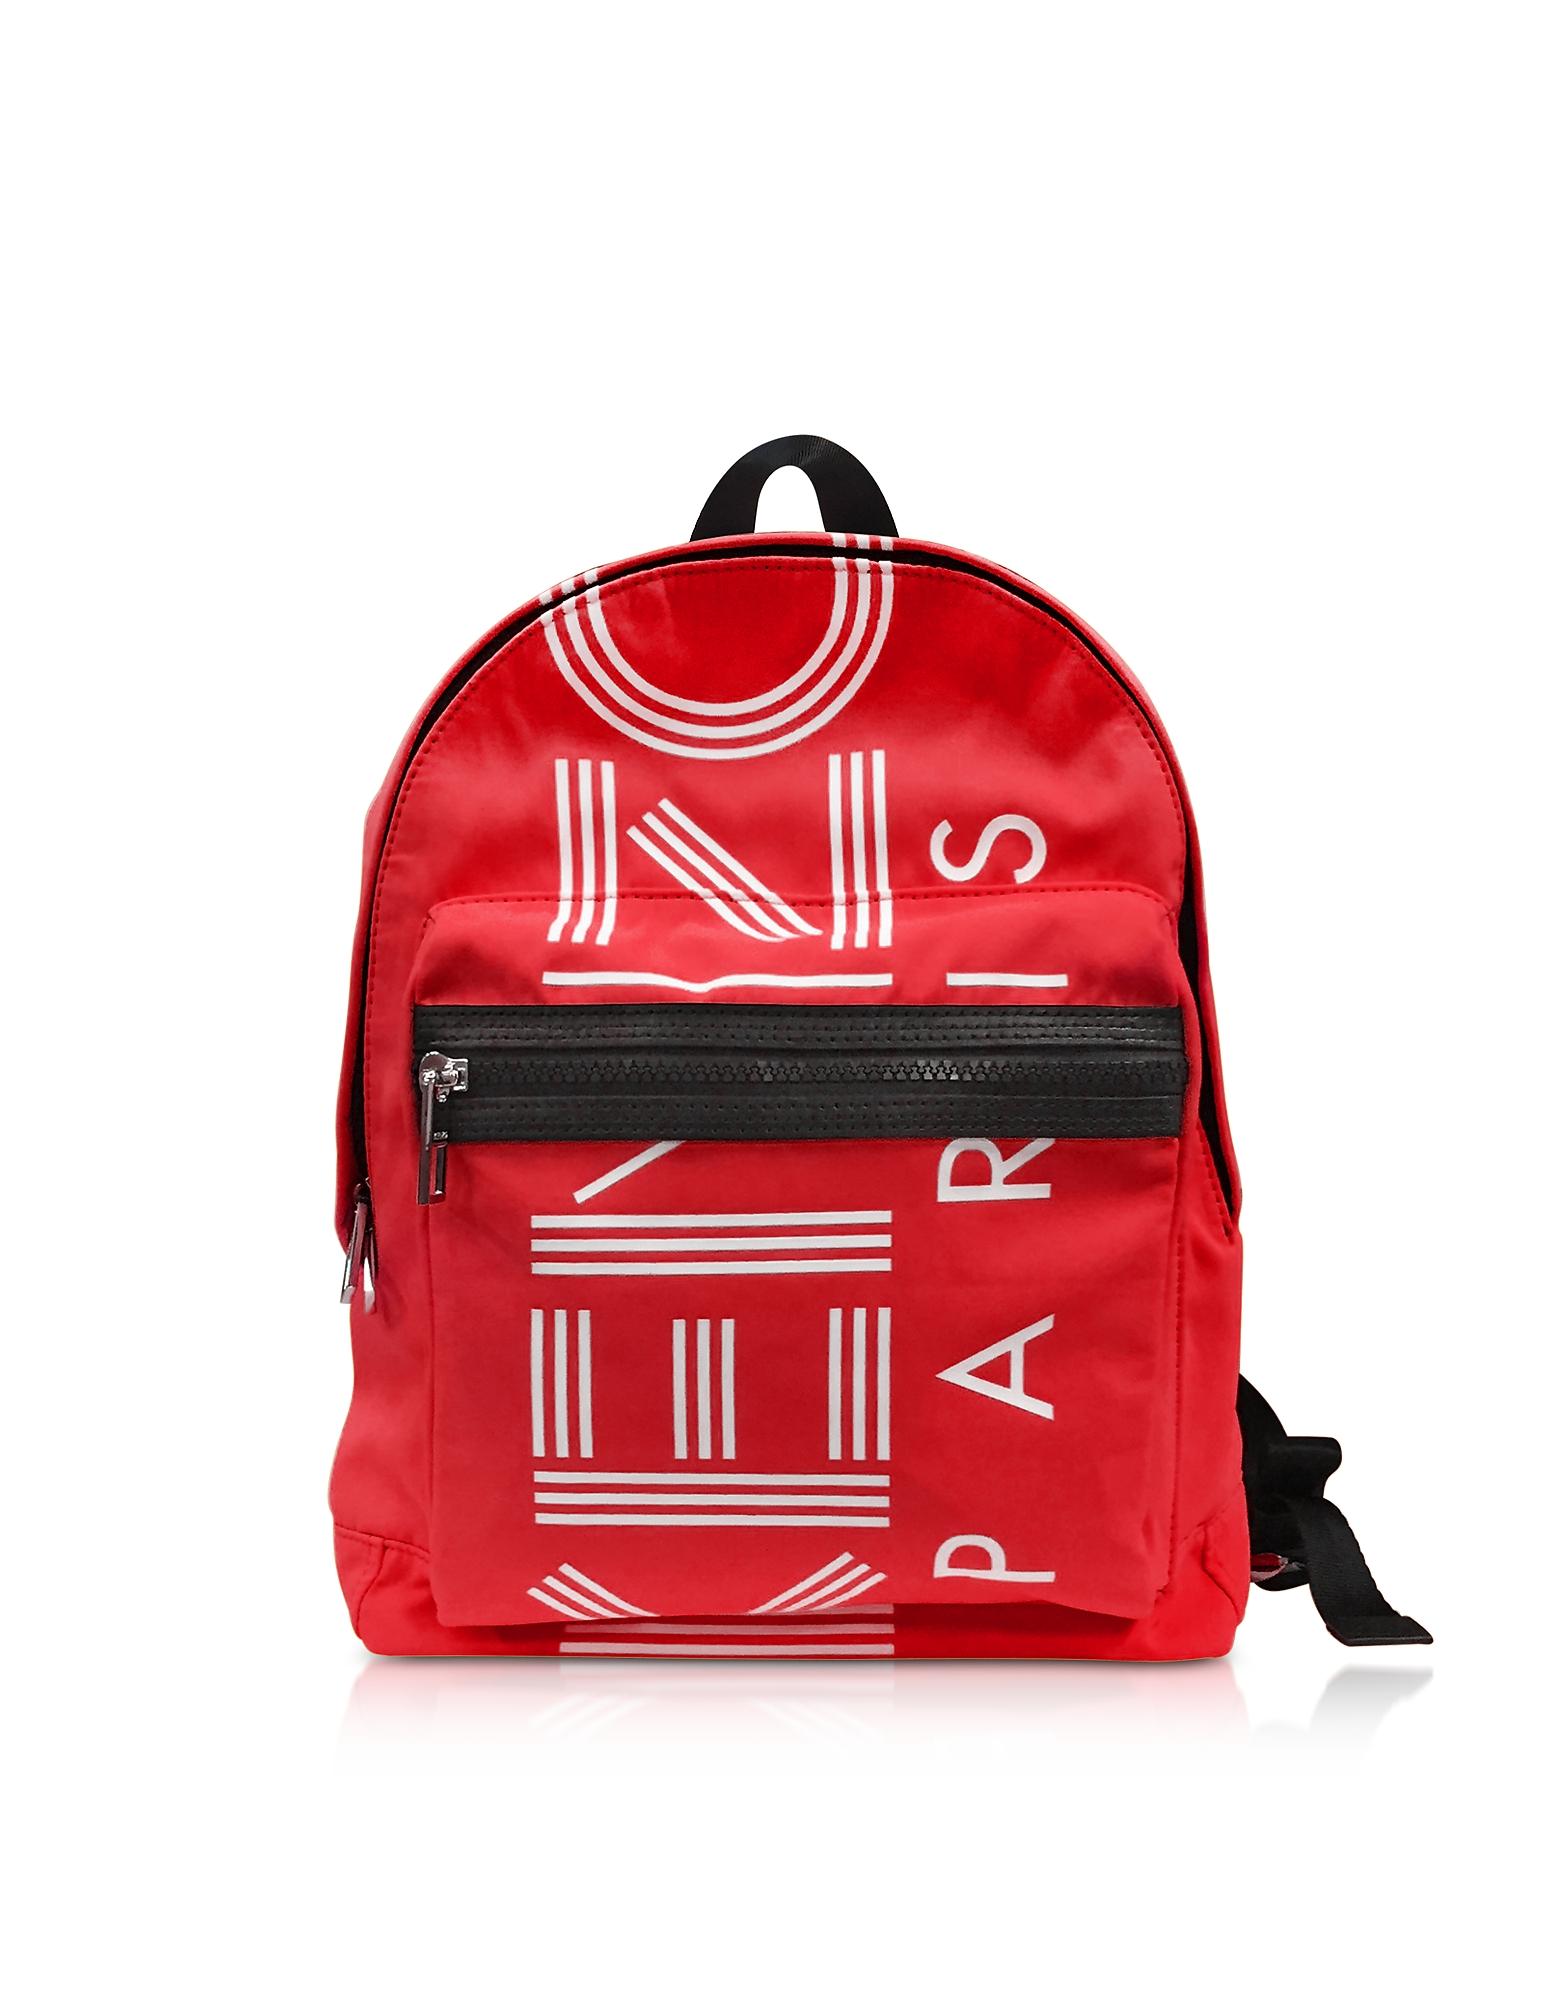 Kenzo Handbags, Red Nylon Medium Kenzo Sport Backpack